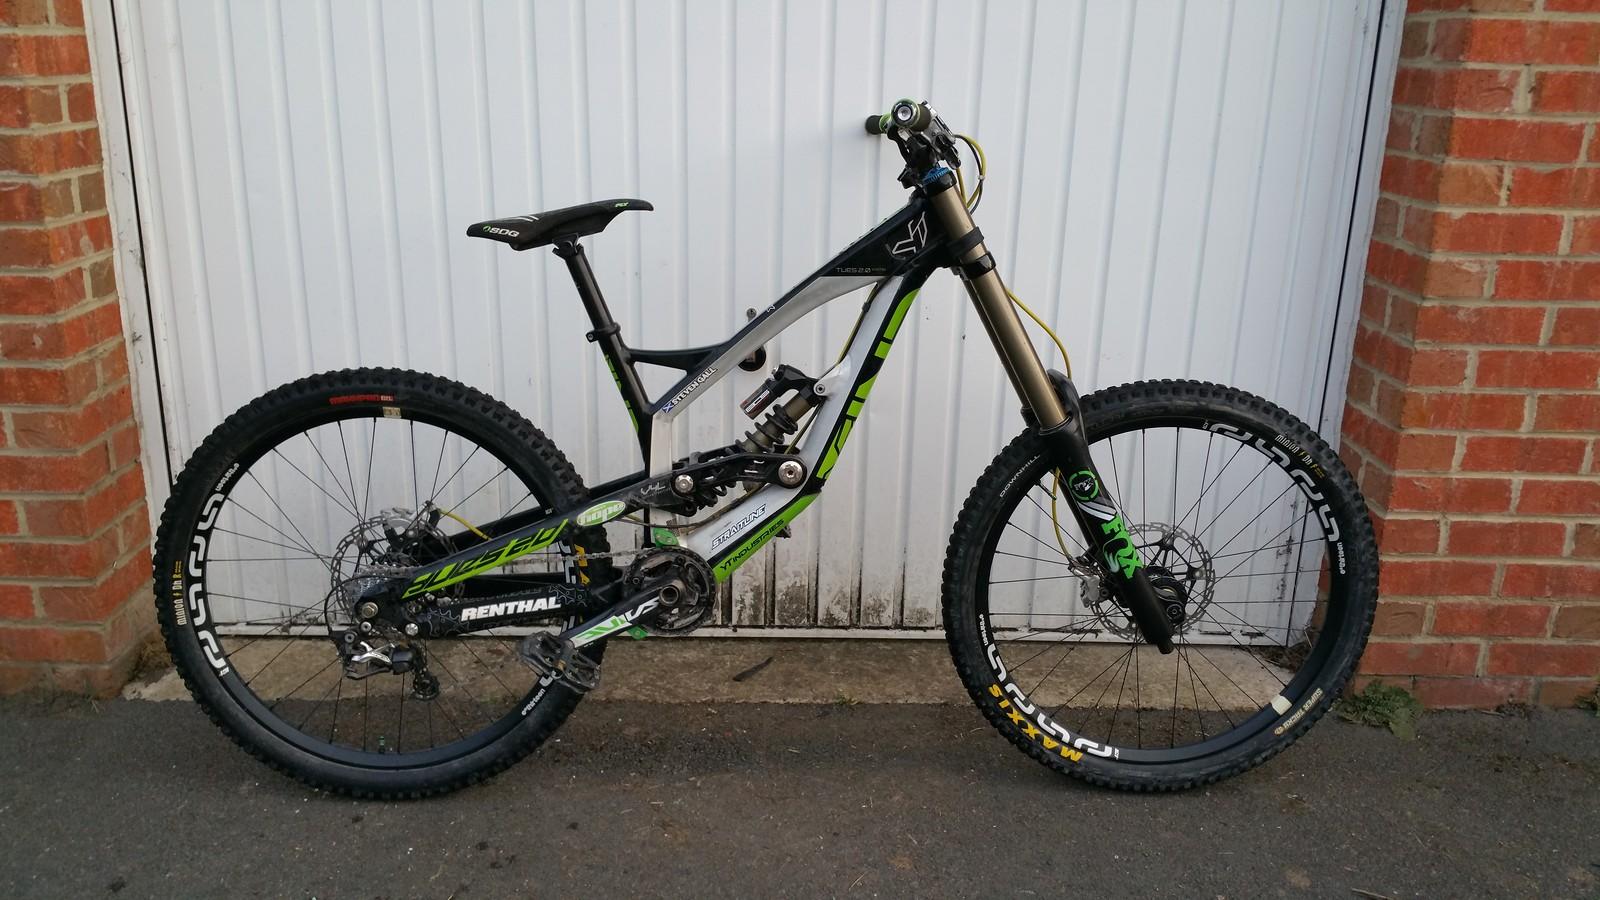 36c2da830b5 2014 YT Industries Tues 2.0 Comp - steve45's Bike Check - Vital MTB